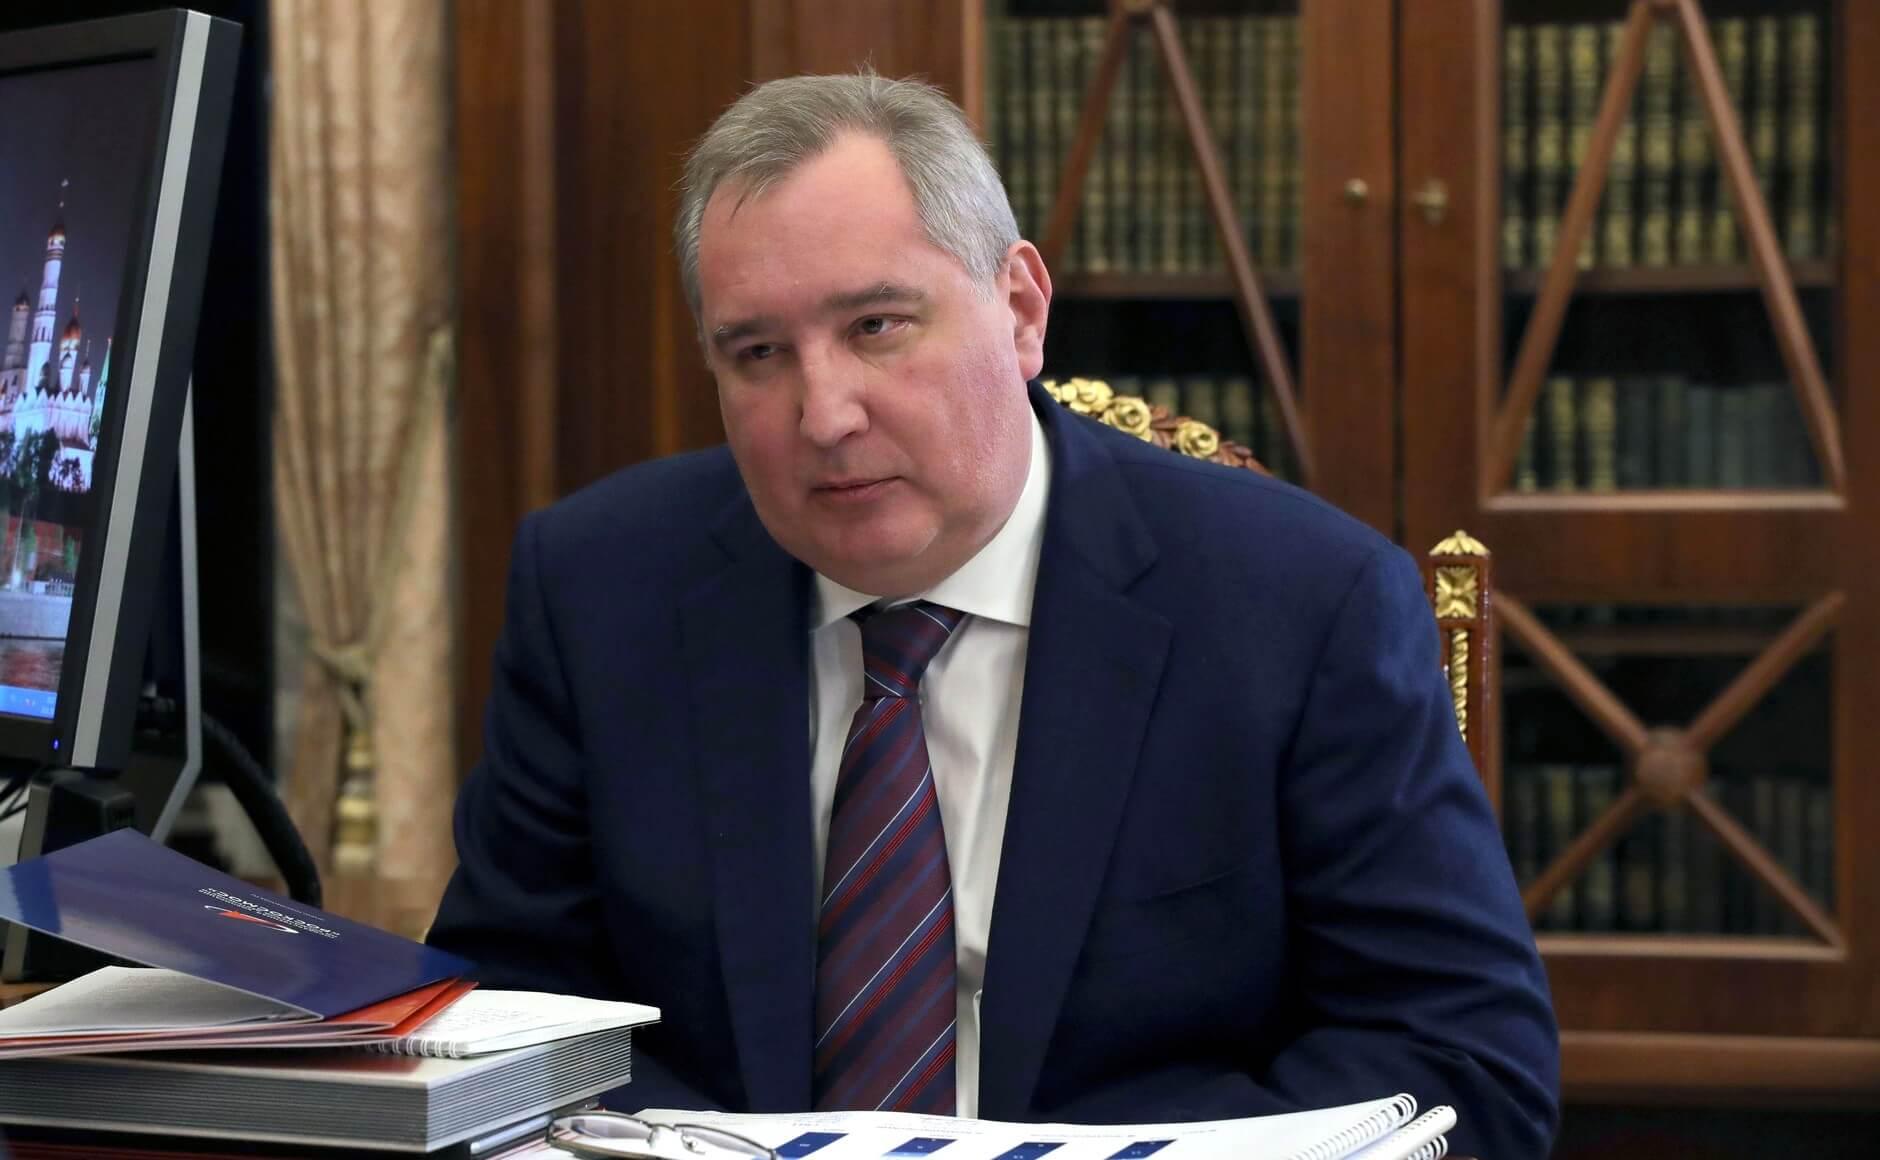 Kremlin Pool/Globallookpress.com